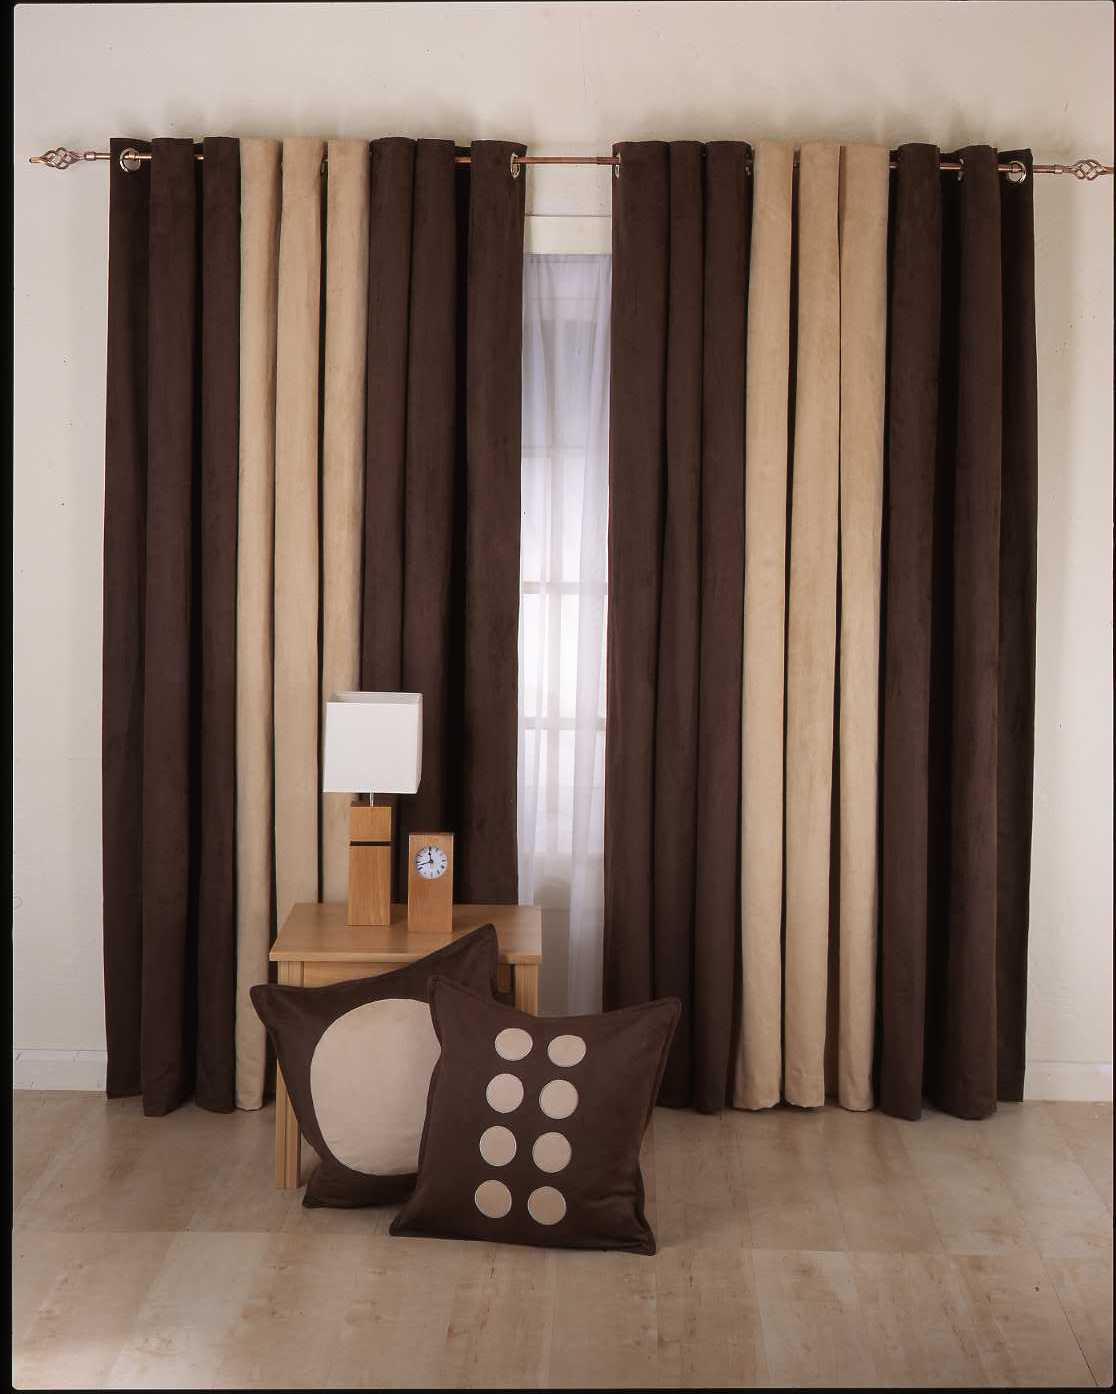 f0bdadfa4869a23d1a6b591370430938 20+ Hottest Curtain Design Ideas for 2020